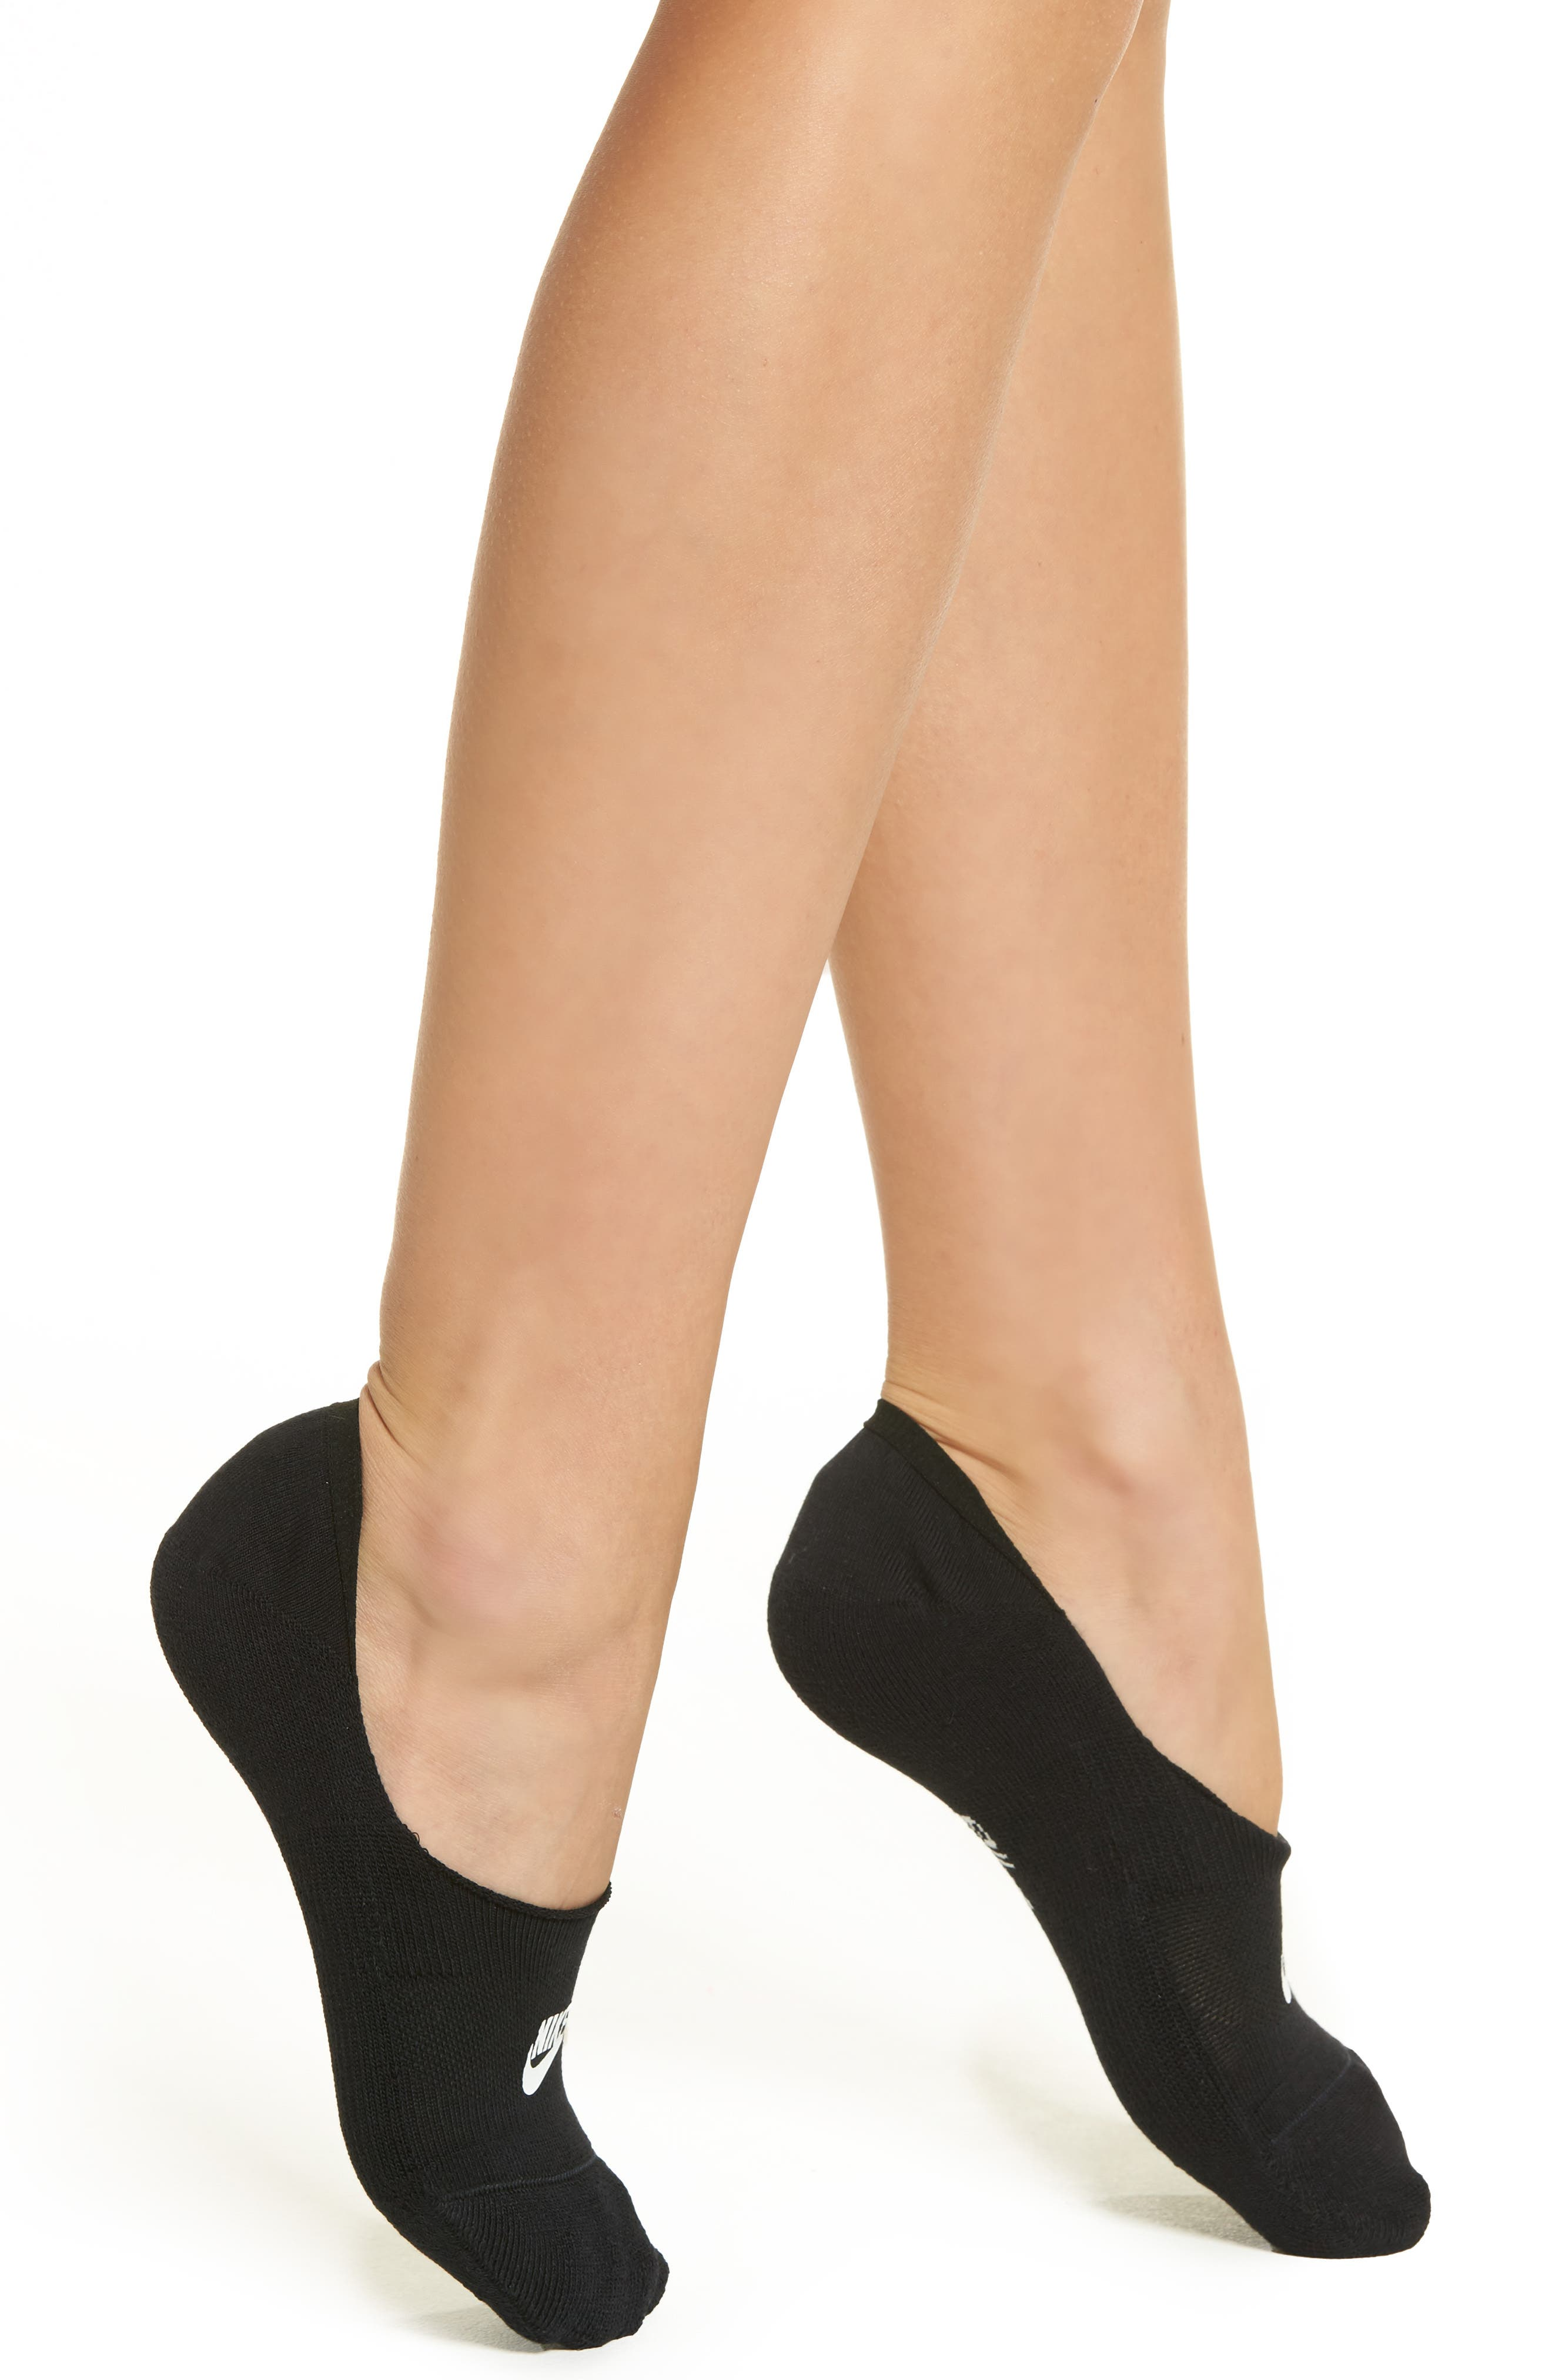 Sportswear Statement No-Show Socks,                         Main,                         color, 010